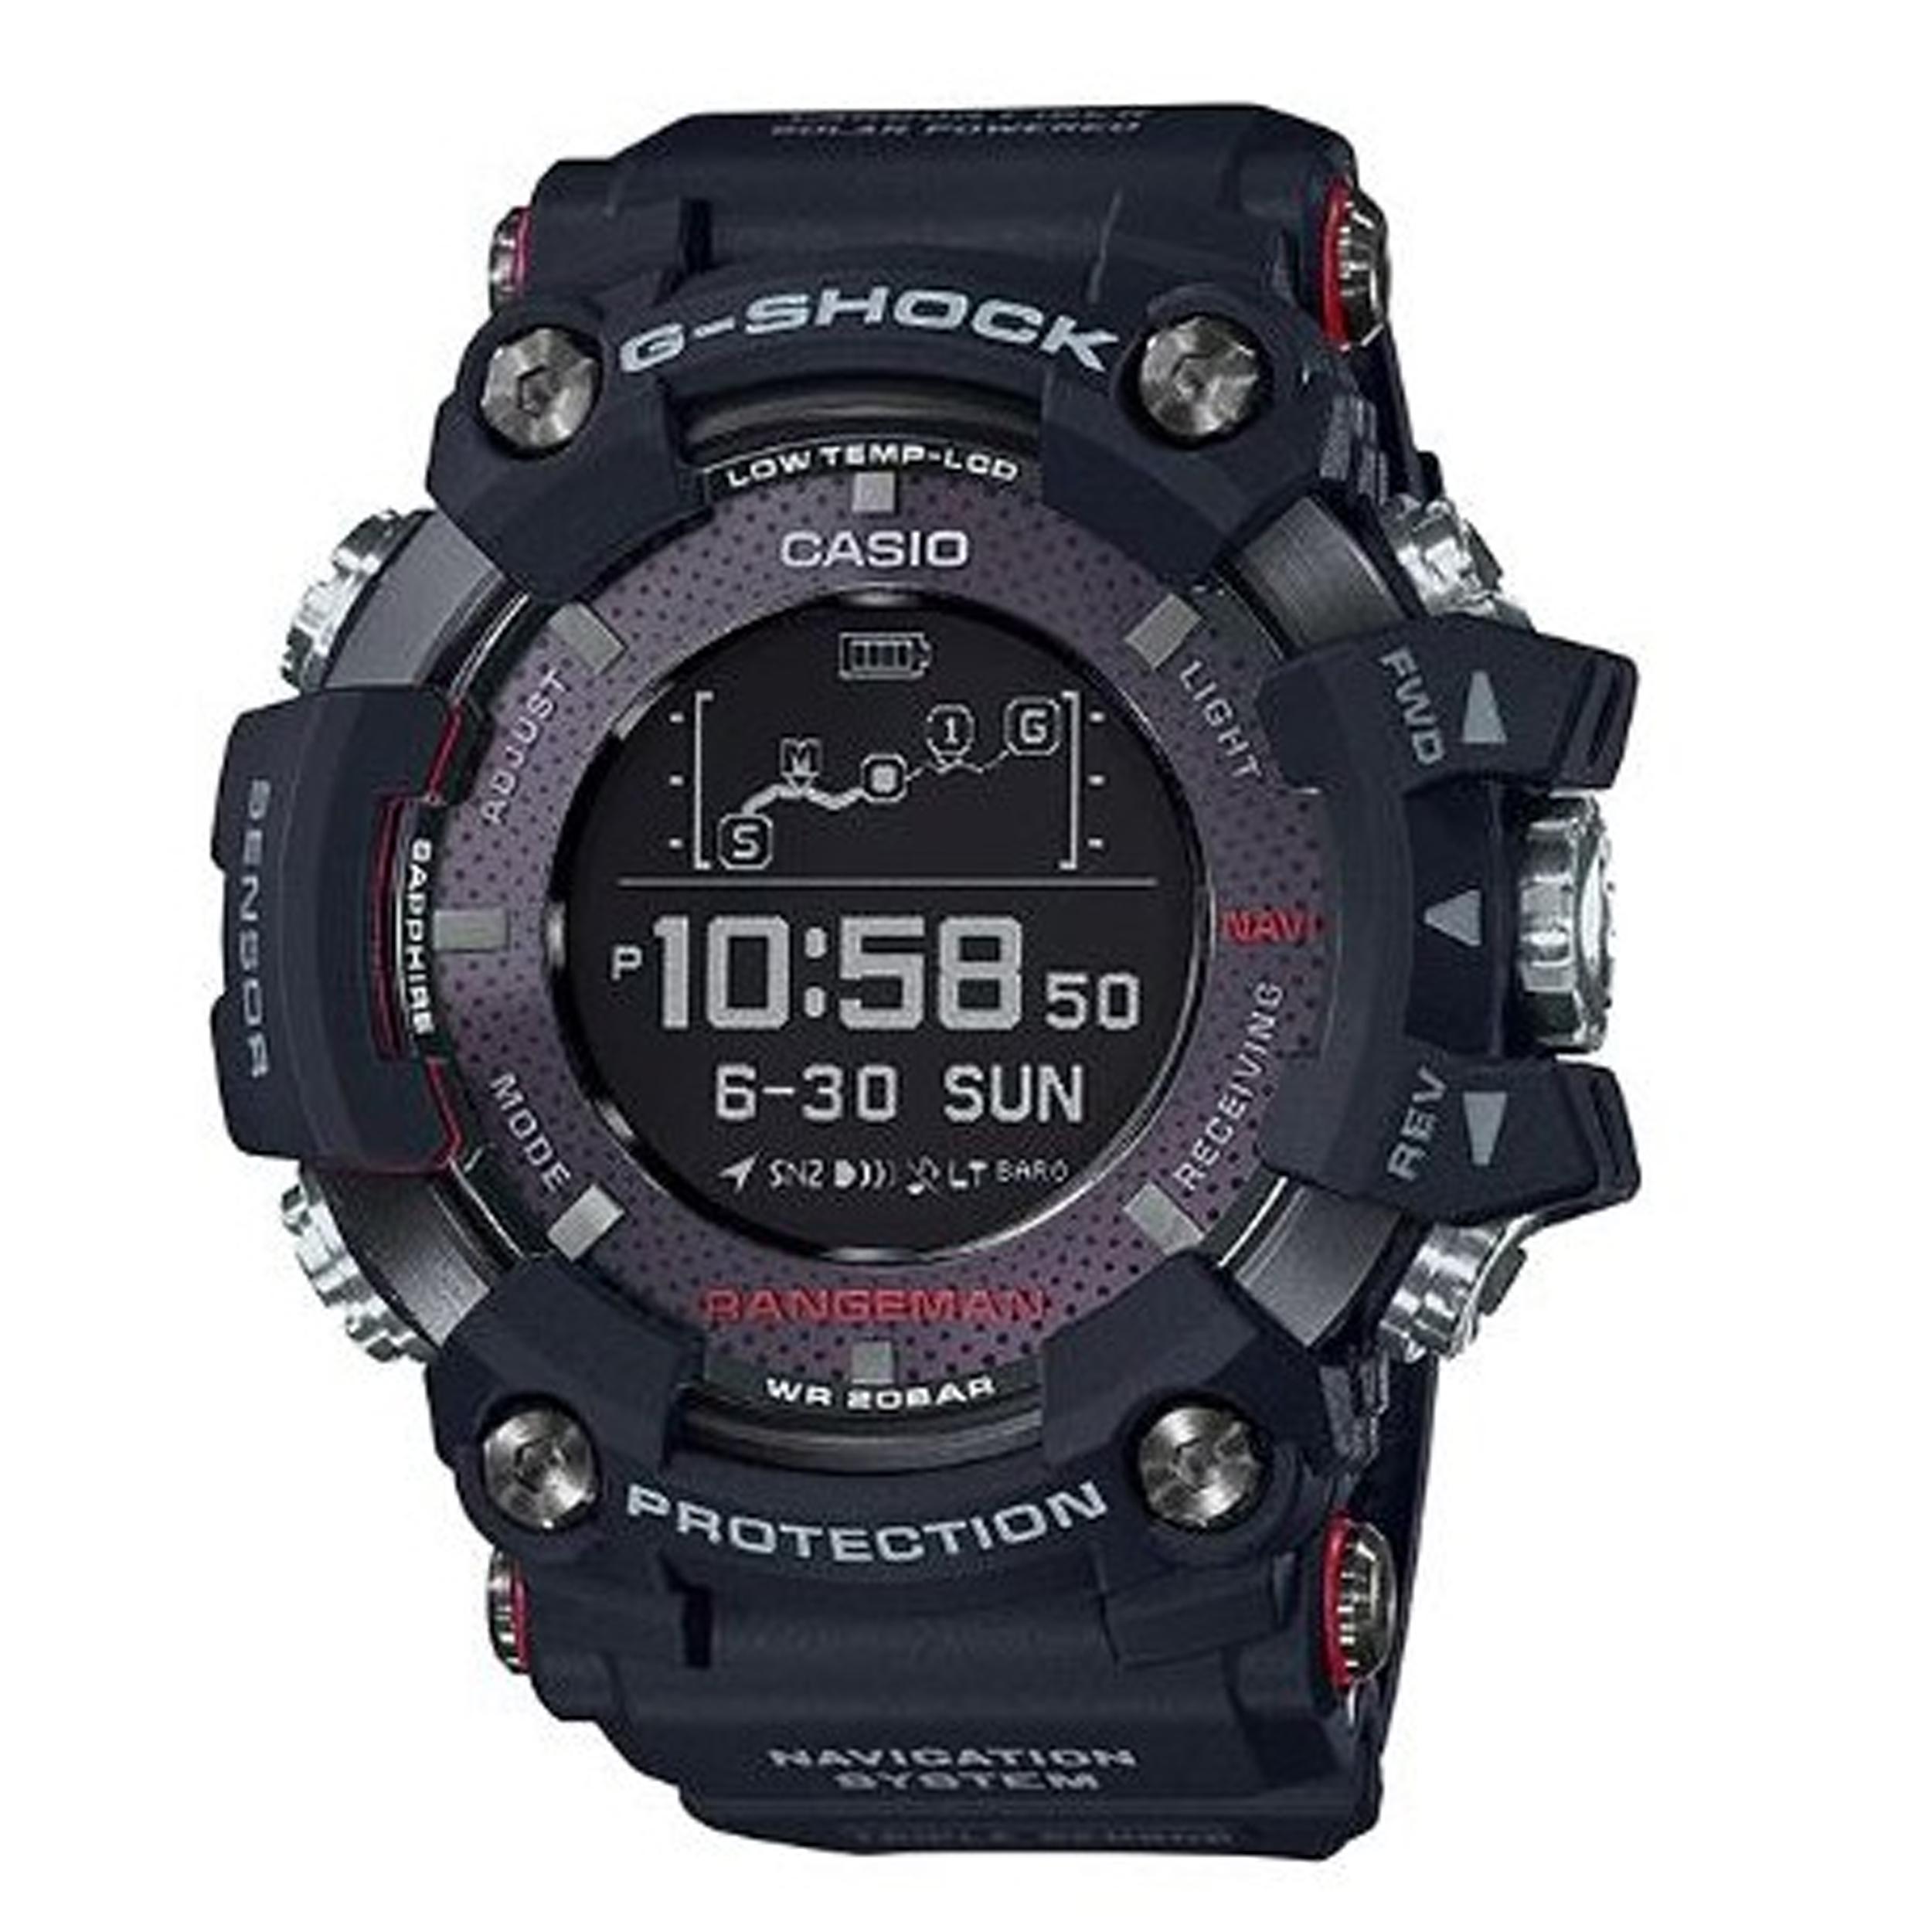 ساعت مچی دیجیتال مردانه کاسیو مدل GPR-B1000-1DR